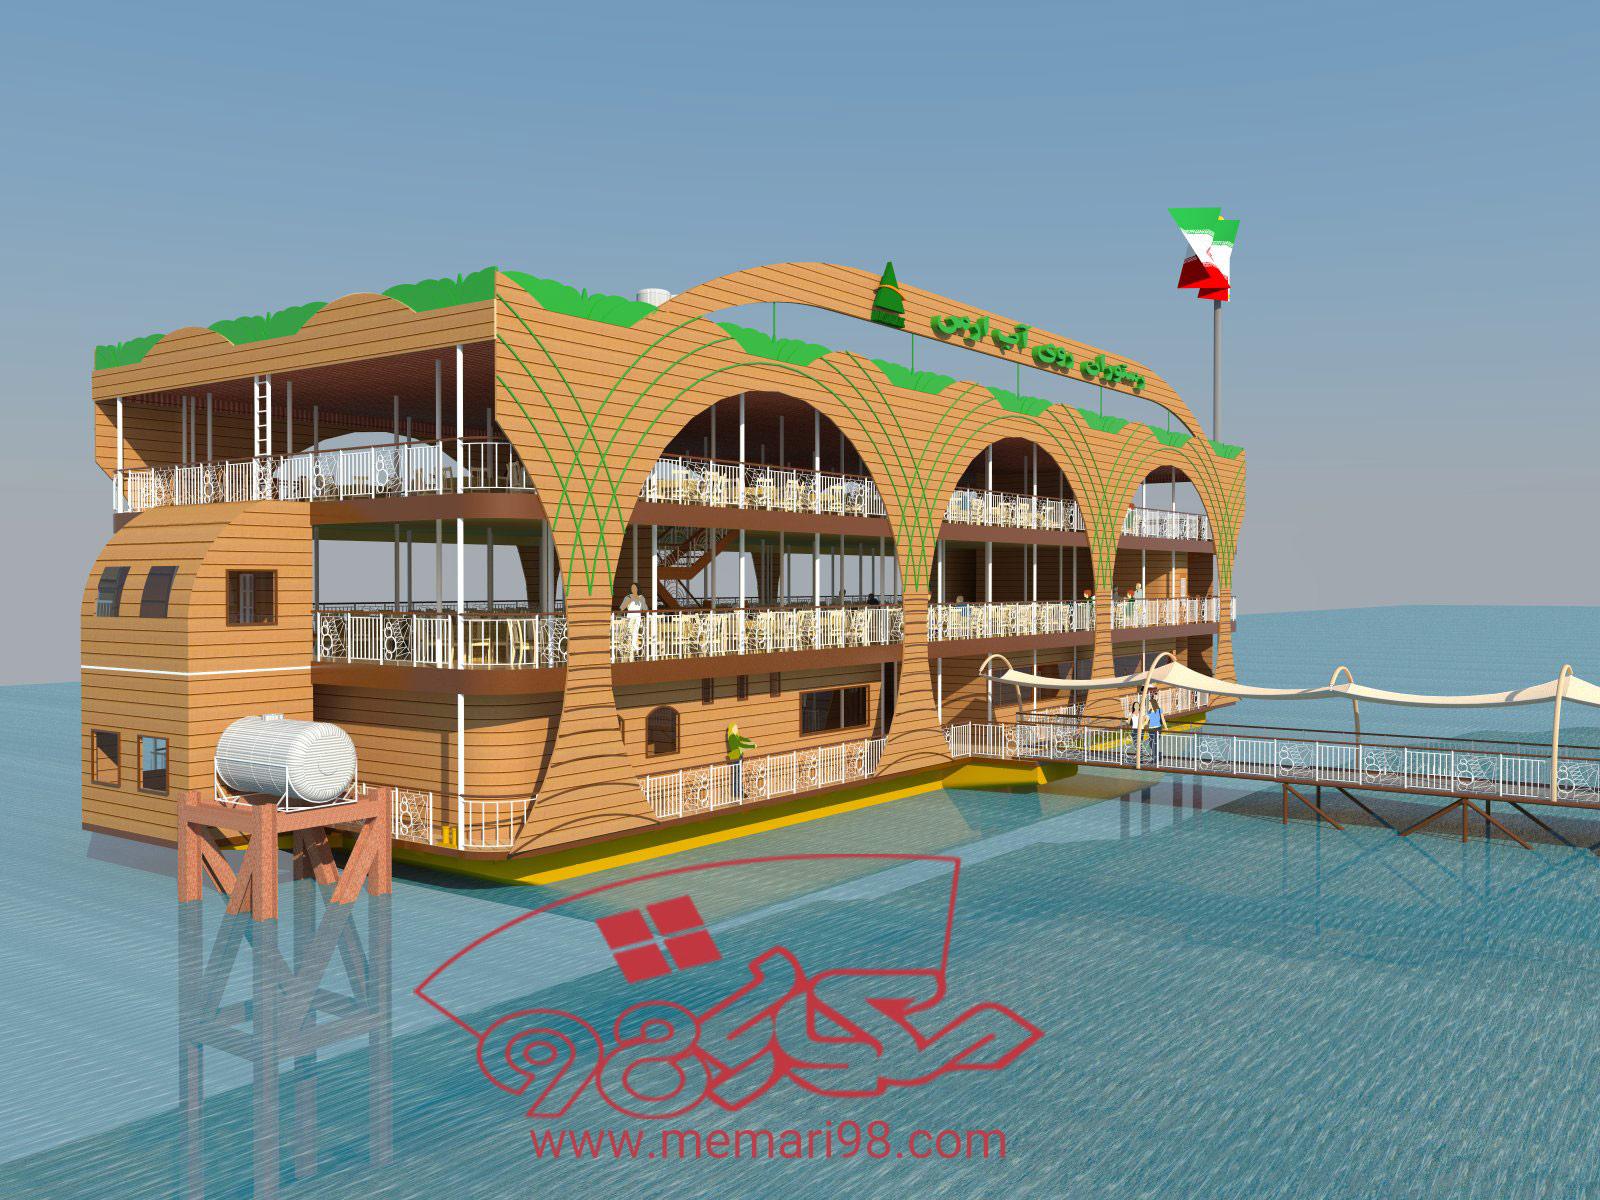 پروژه کامل رستوران روی آب